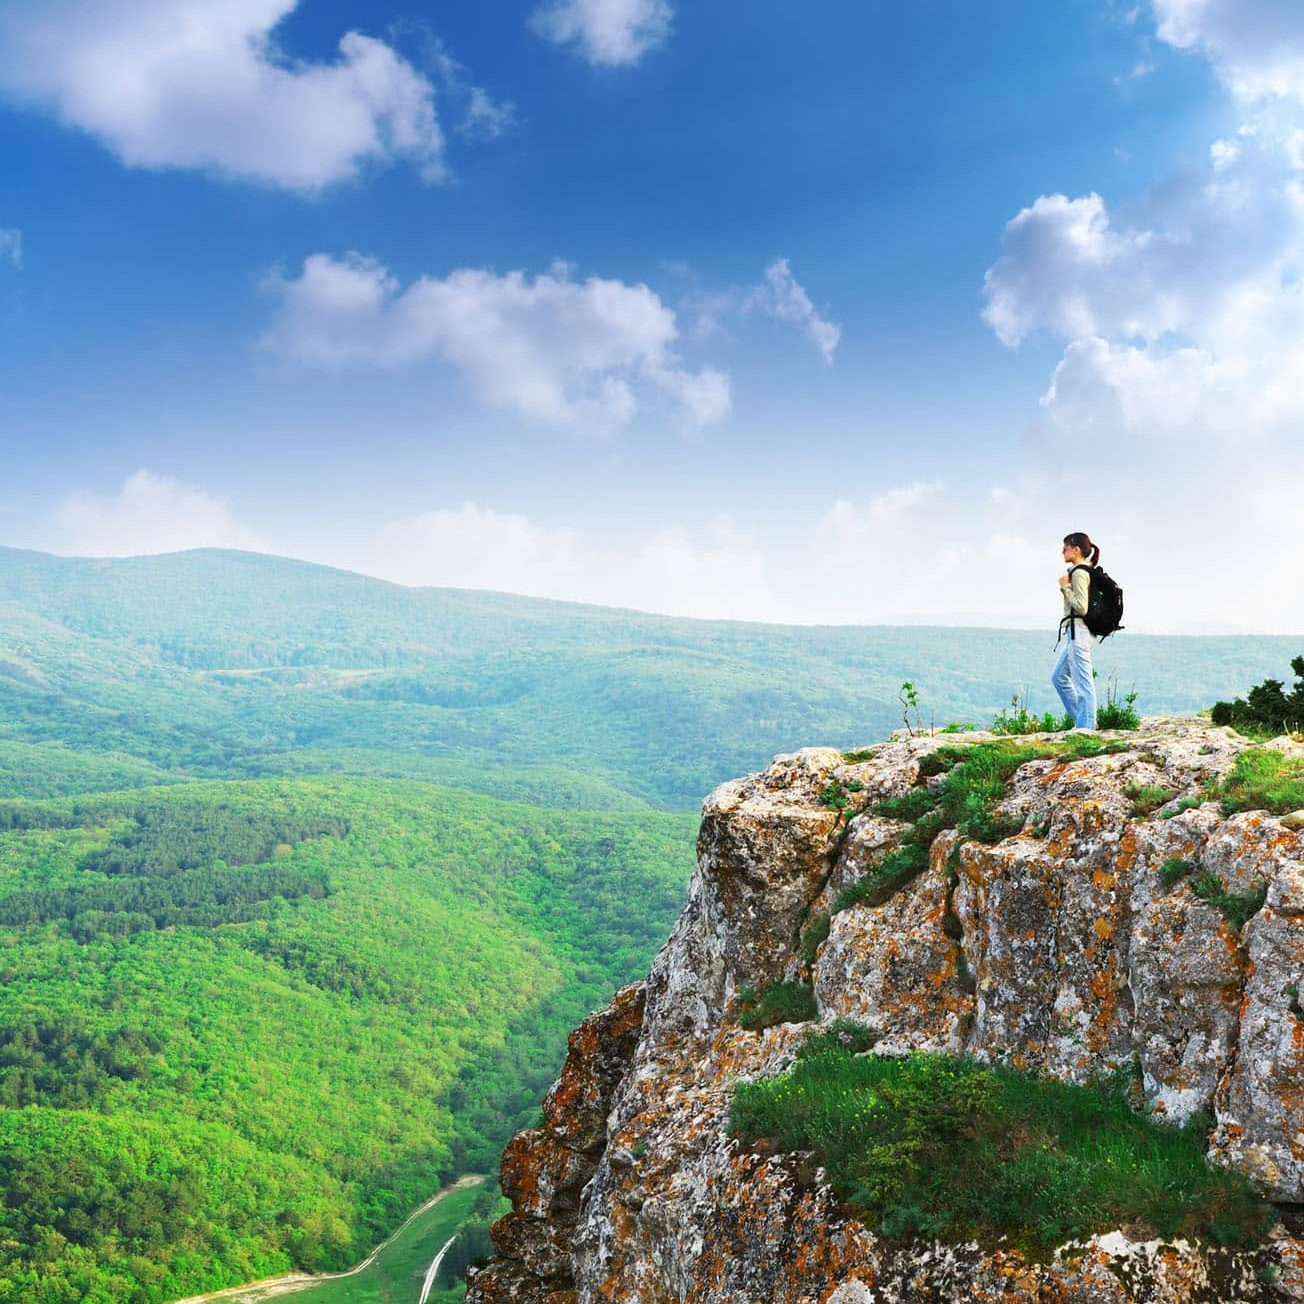 Woman standing on a vista overlooking a green landscape